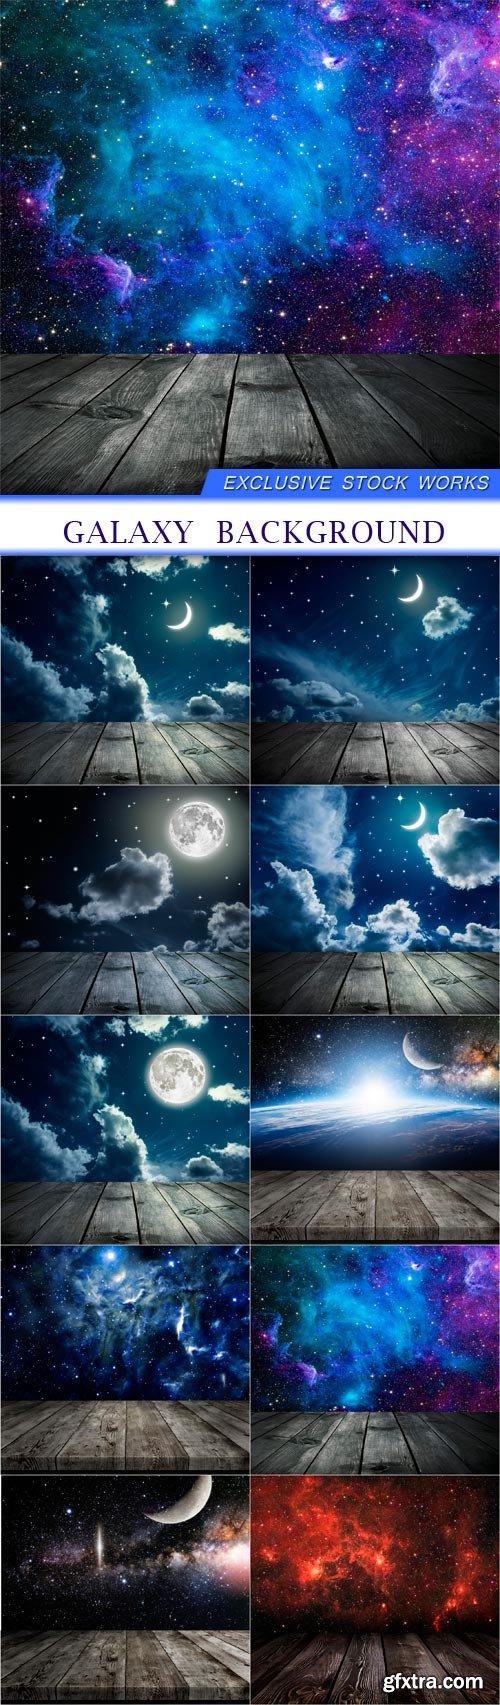 galaxy background 11X JPEG